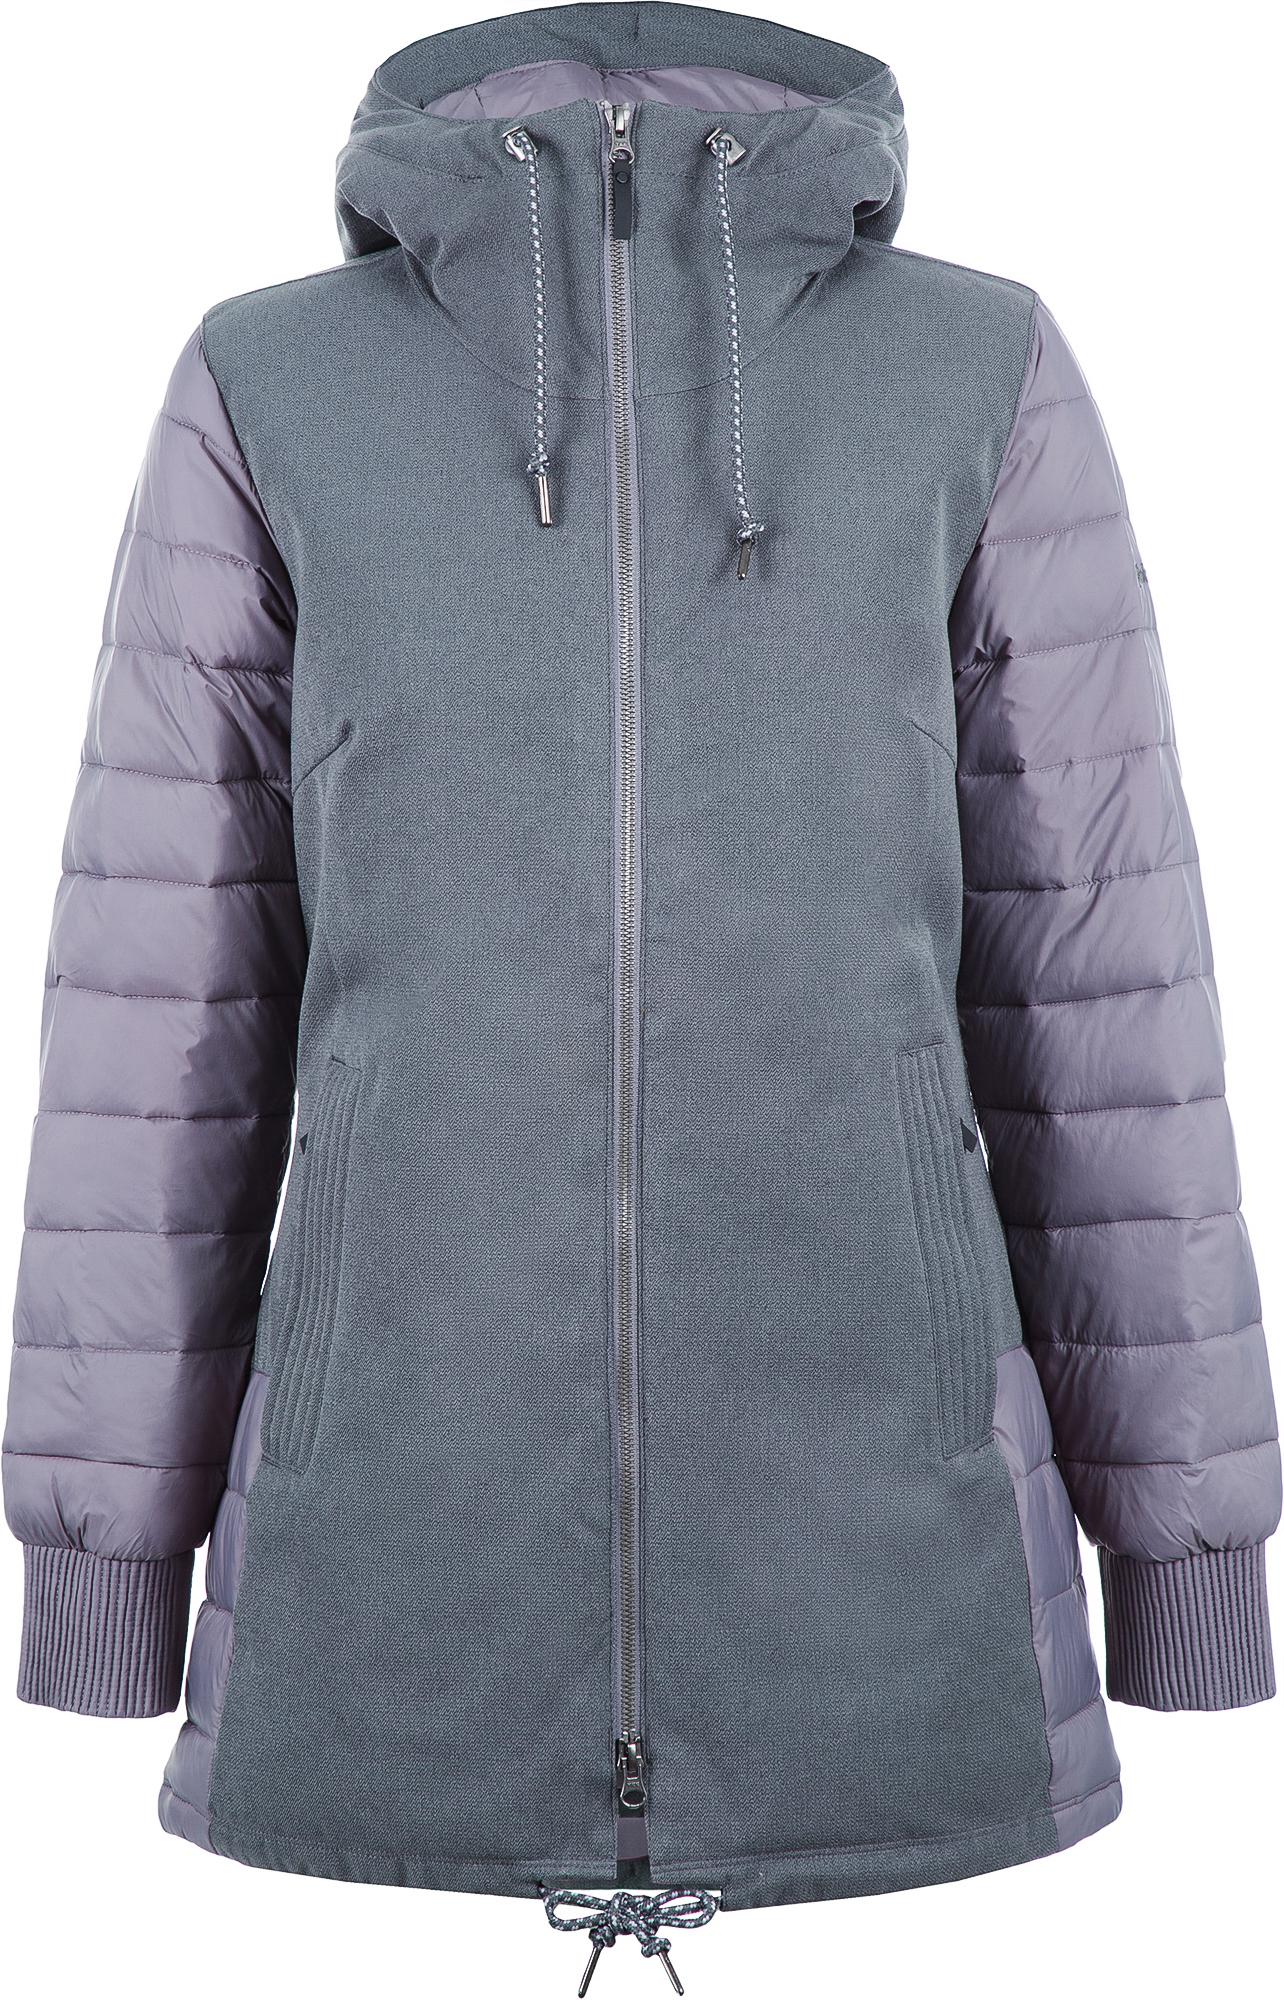 цена на Columbia Куртка утепленная женская Columbia Boundary Bay, размер 50